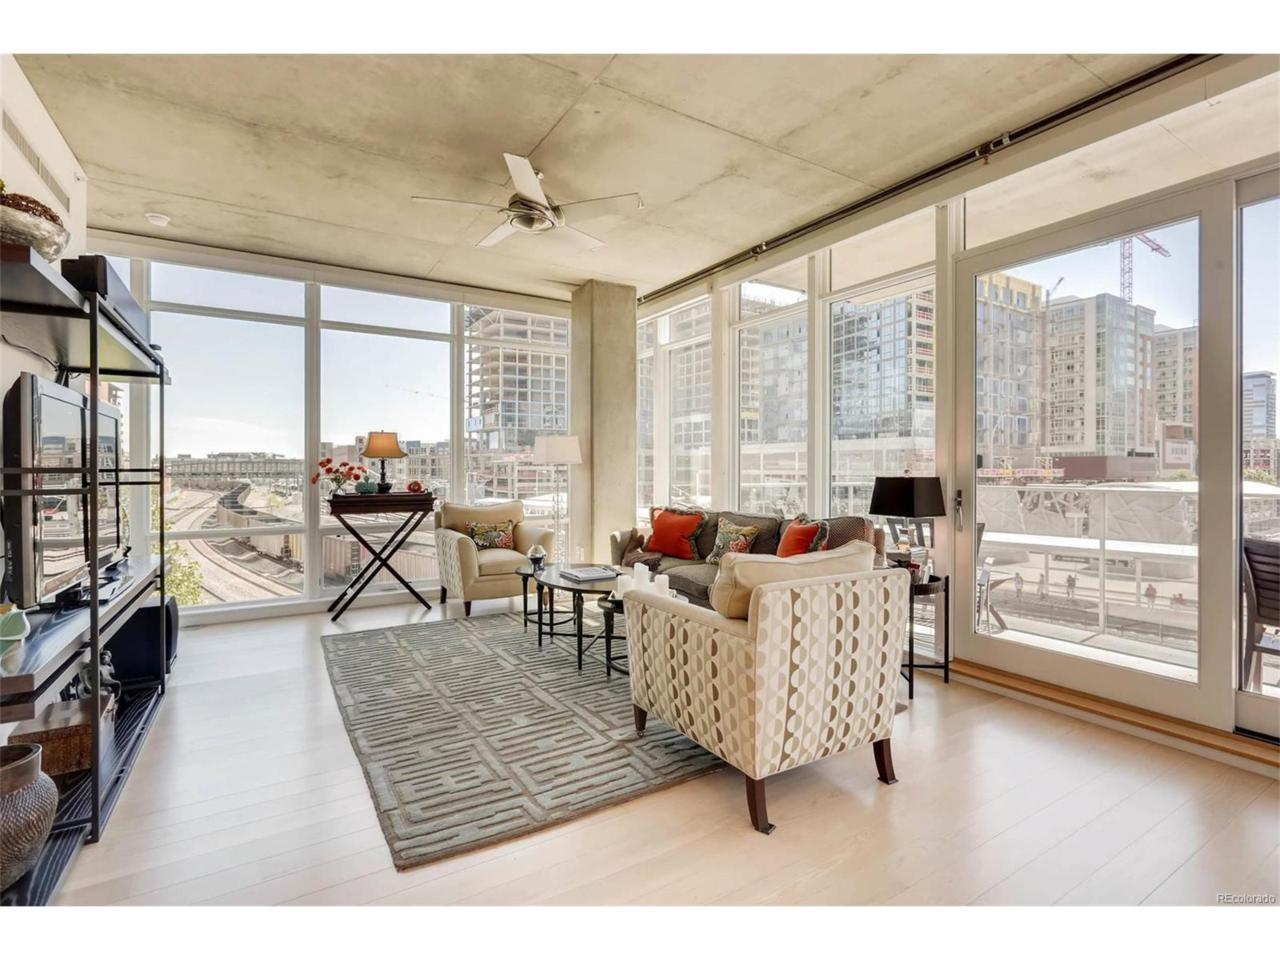 1620 Little Raven Street #303, Denver, CO 80202 (MLS #8619002) :: 8z Real Estate